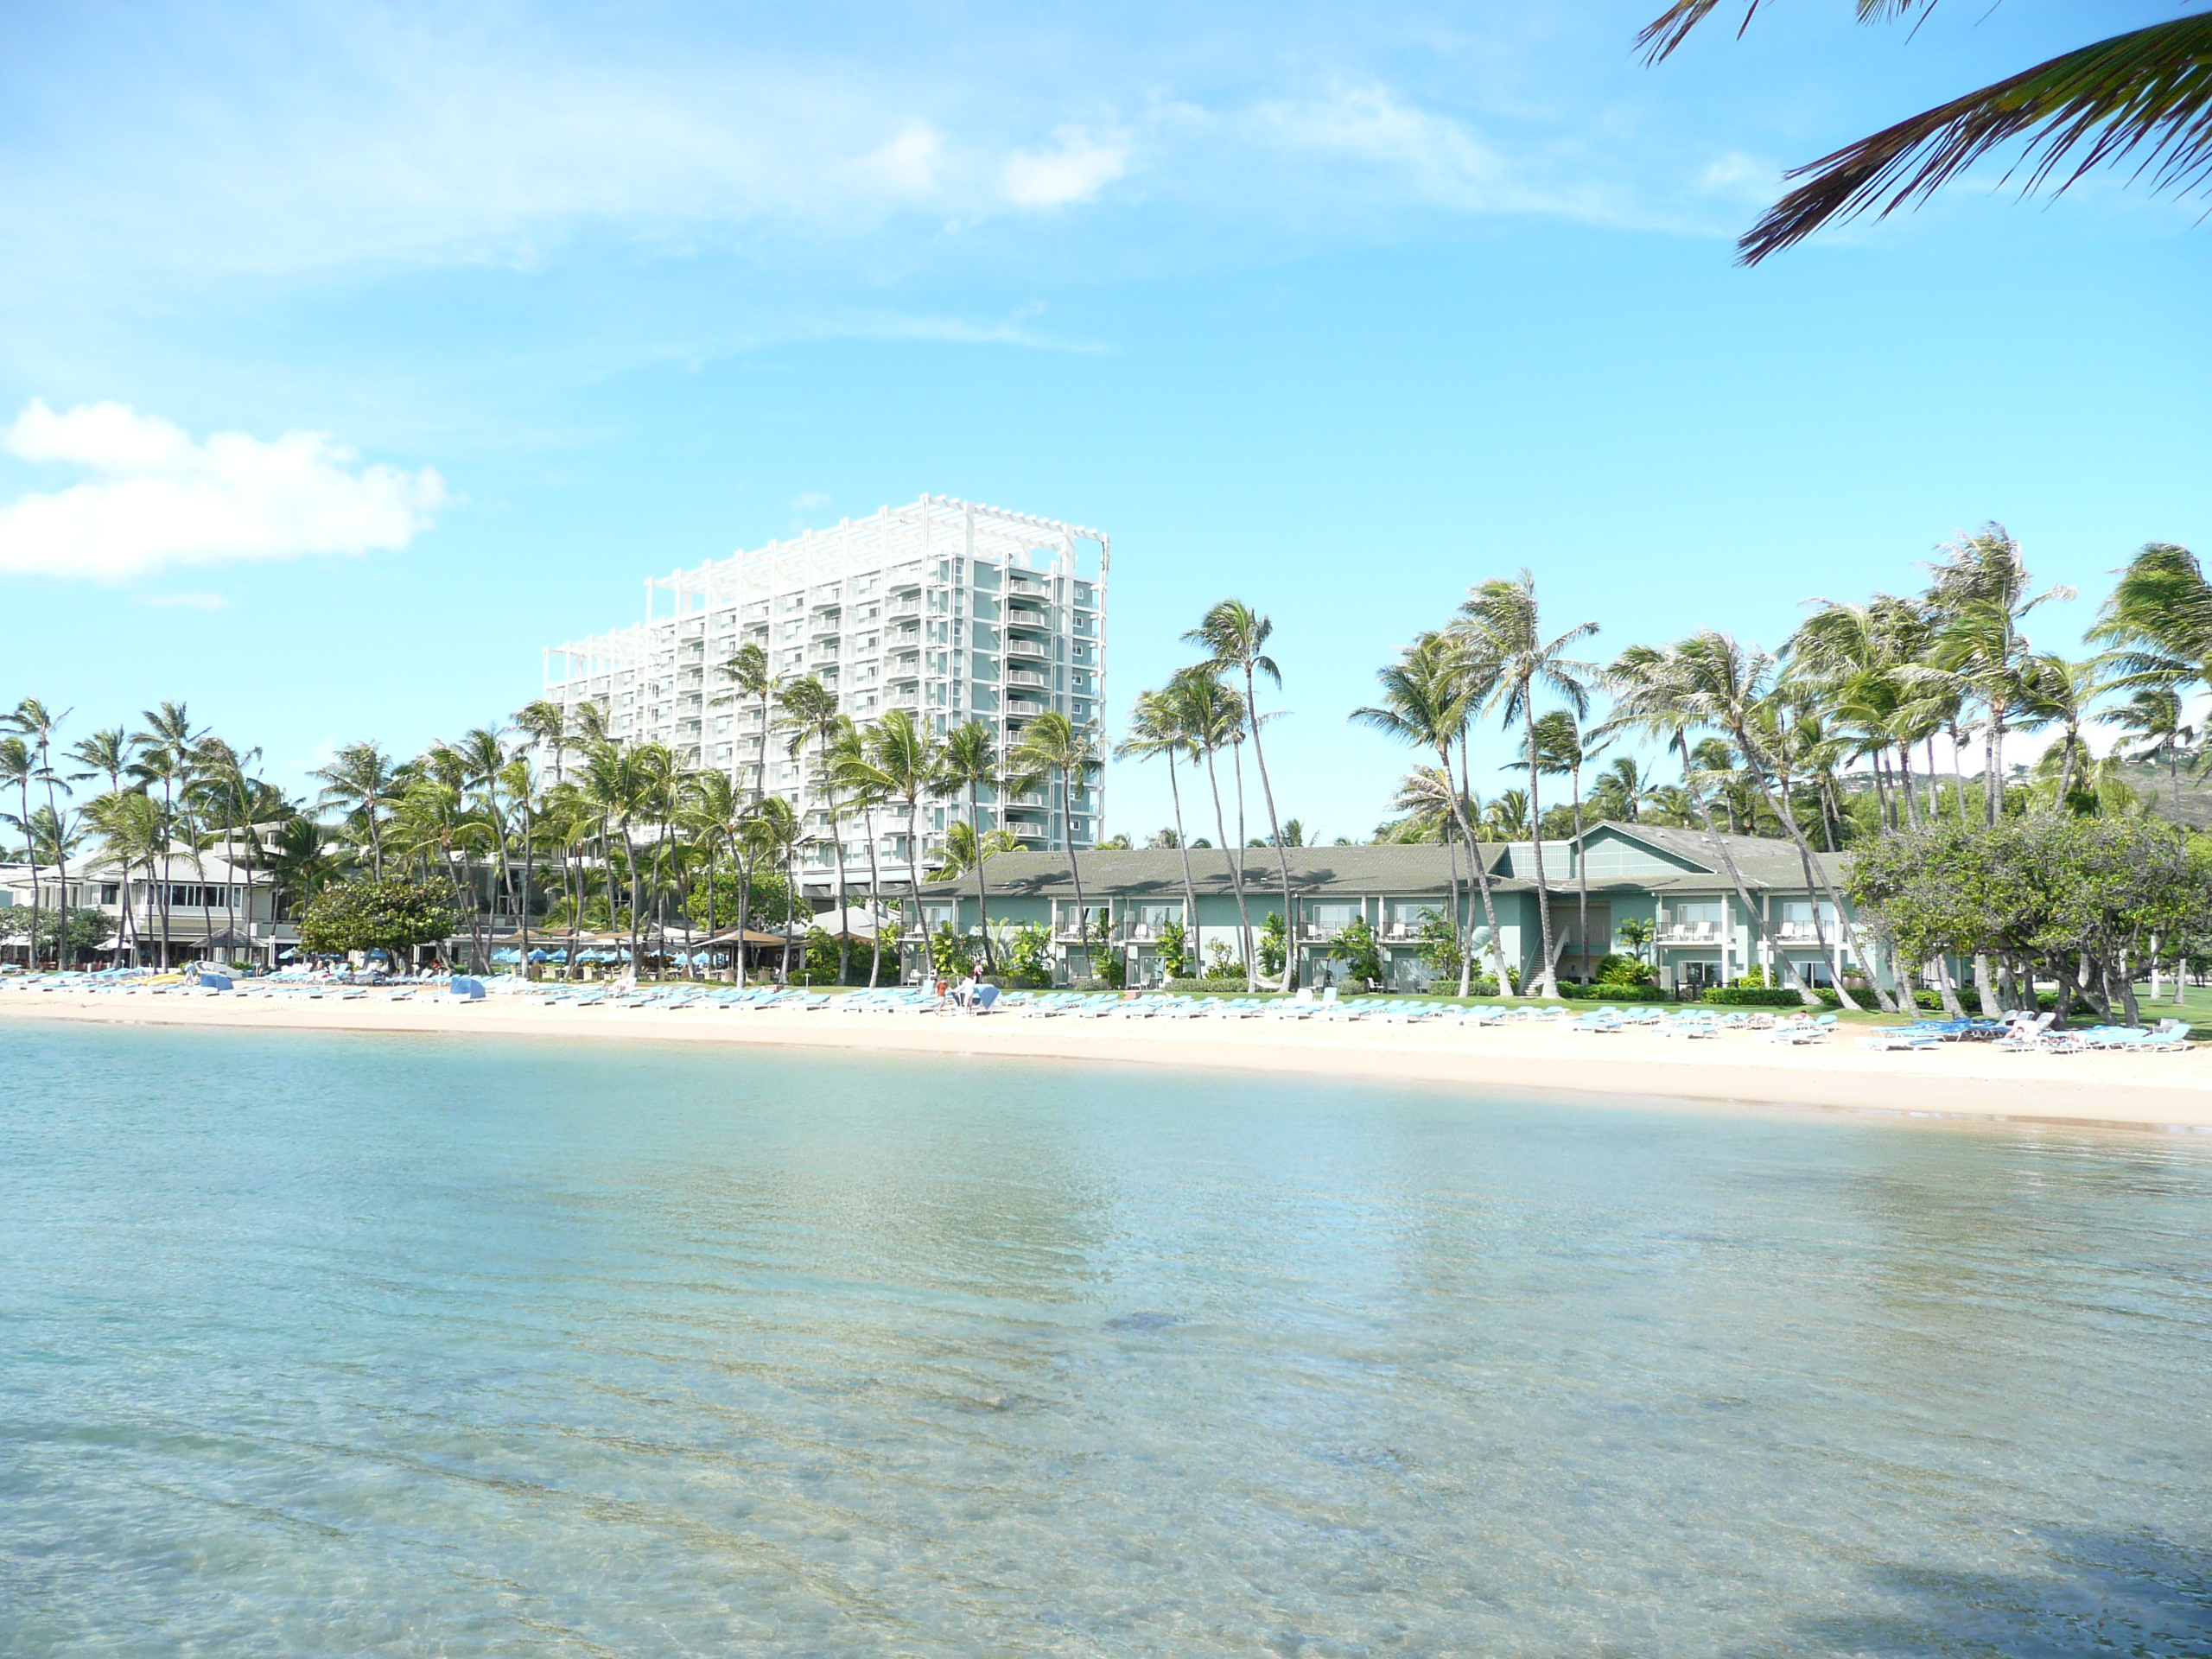 Kahala Resort Oahu Hawaii